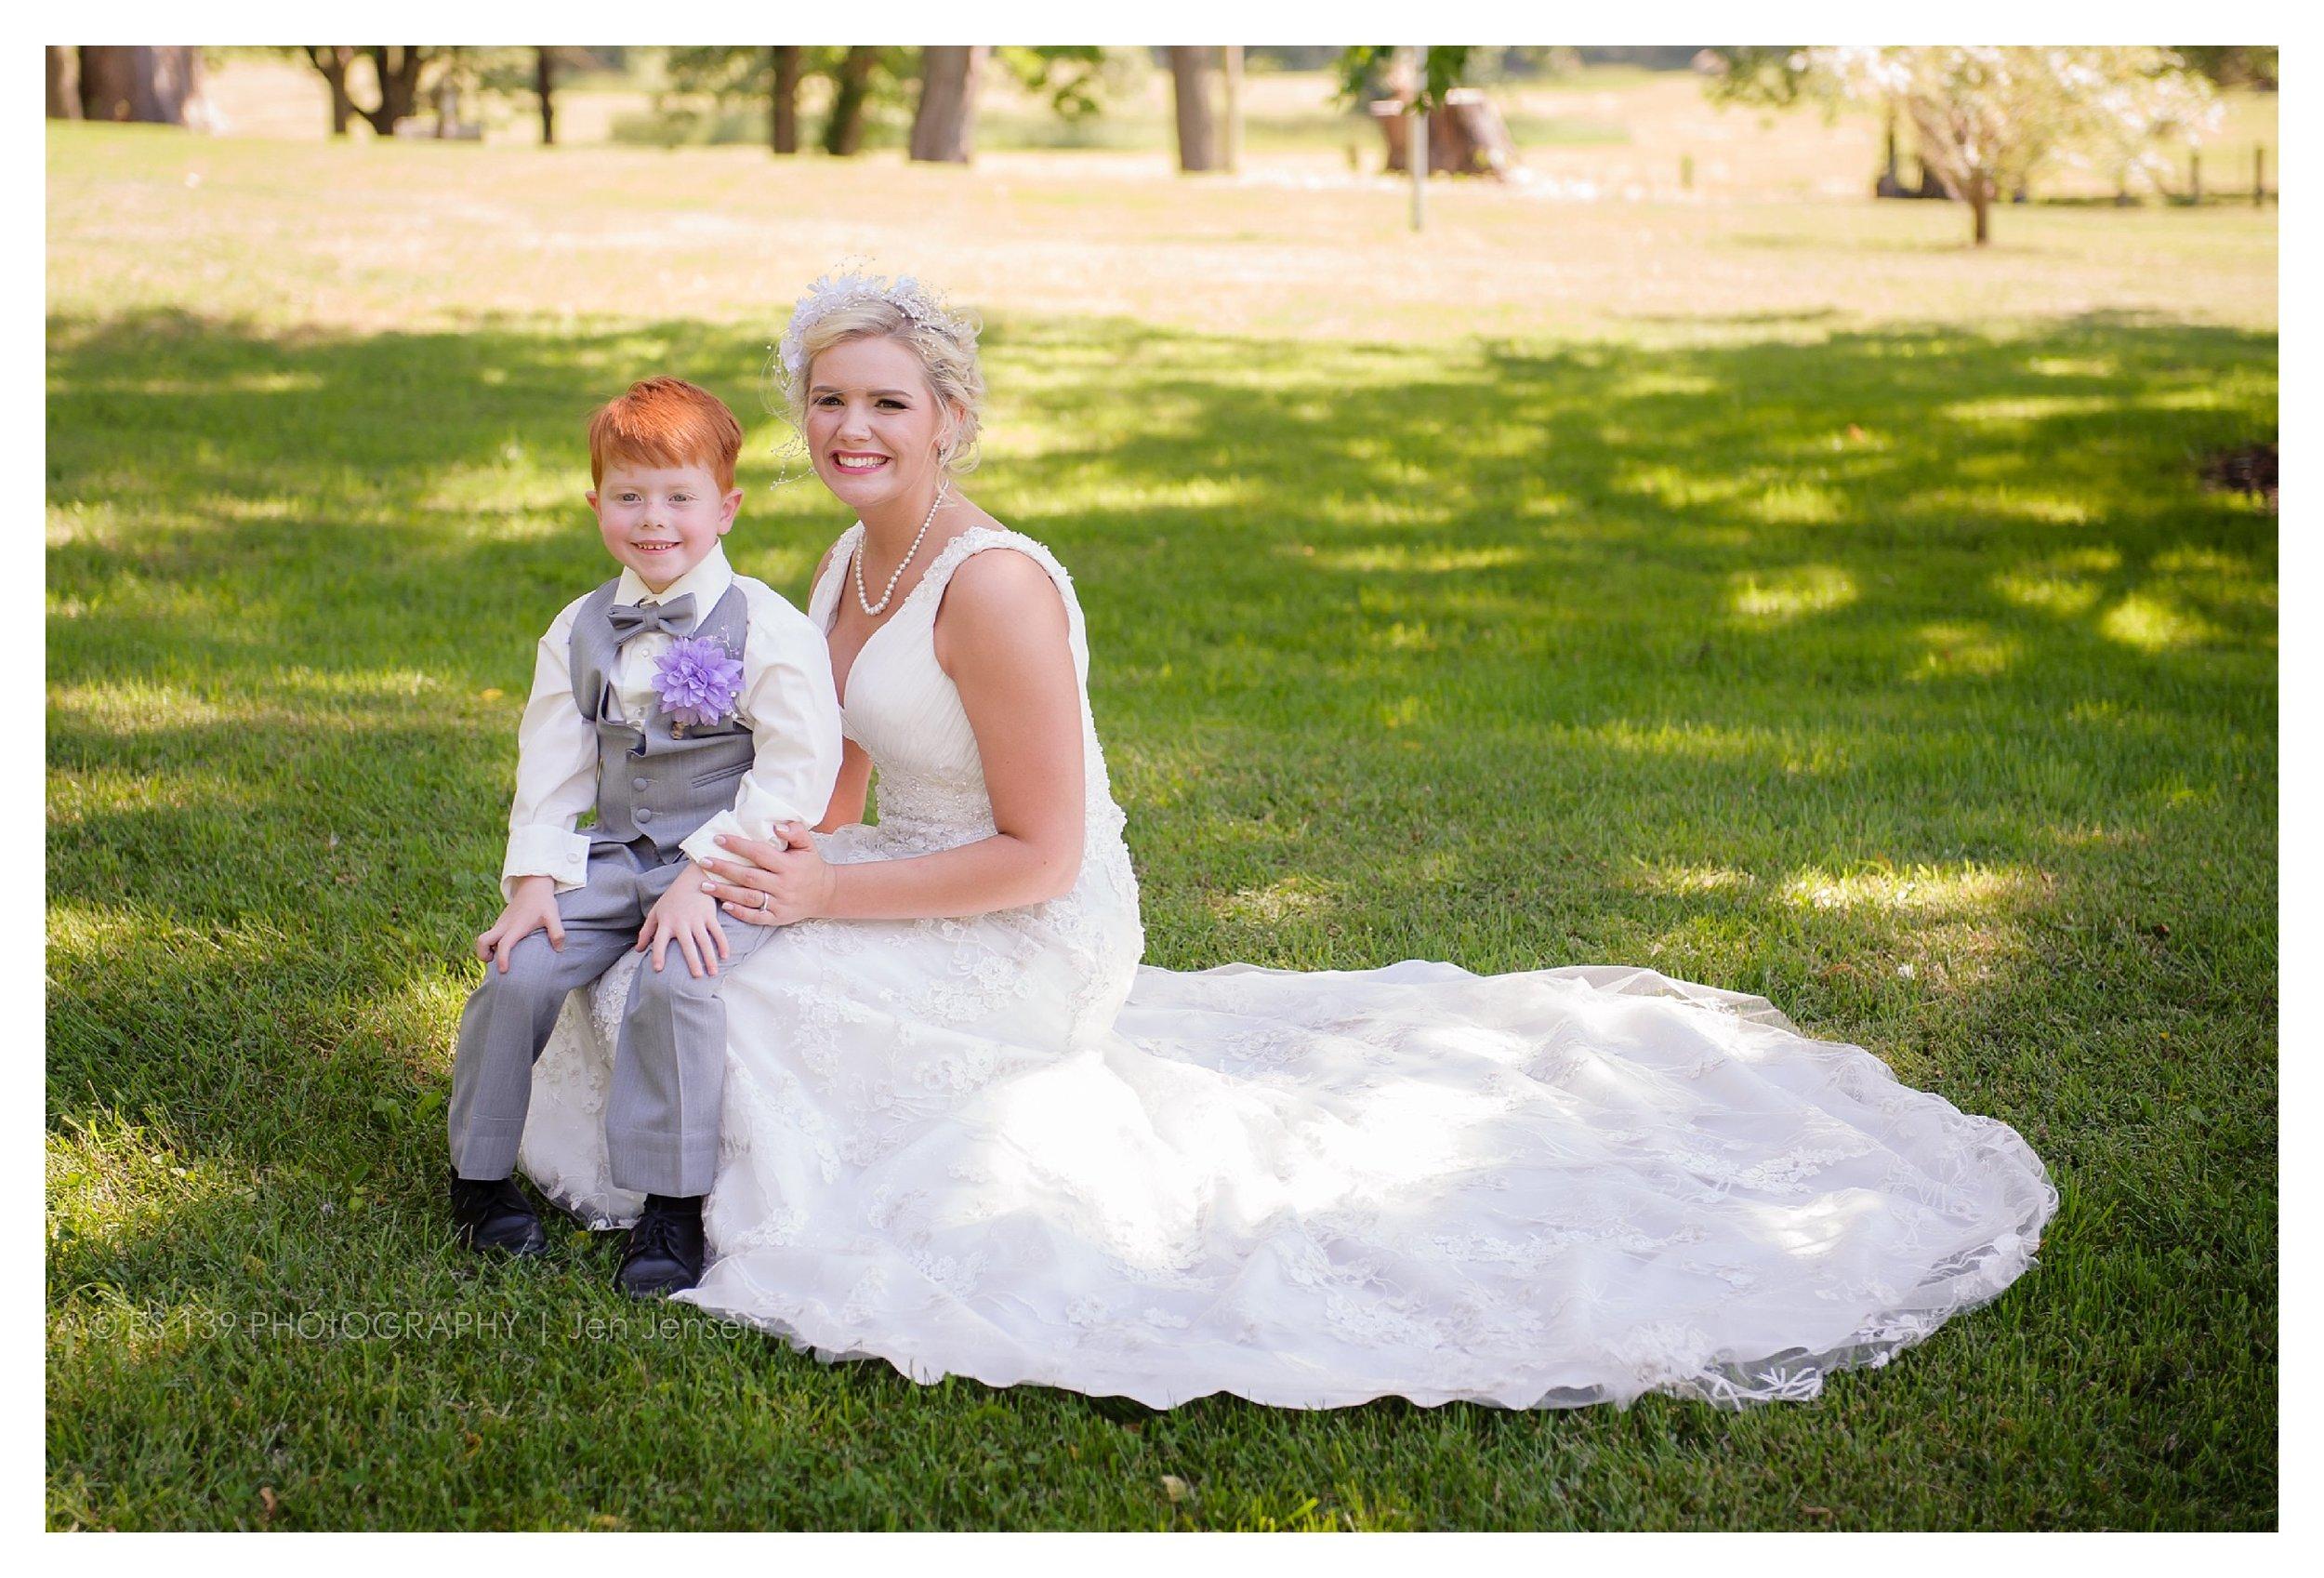 oregon Illinois oak lane farm wisconsin wedding photographer bayfield wi ps 139 photography jen jensen_0246.jpg